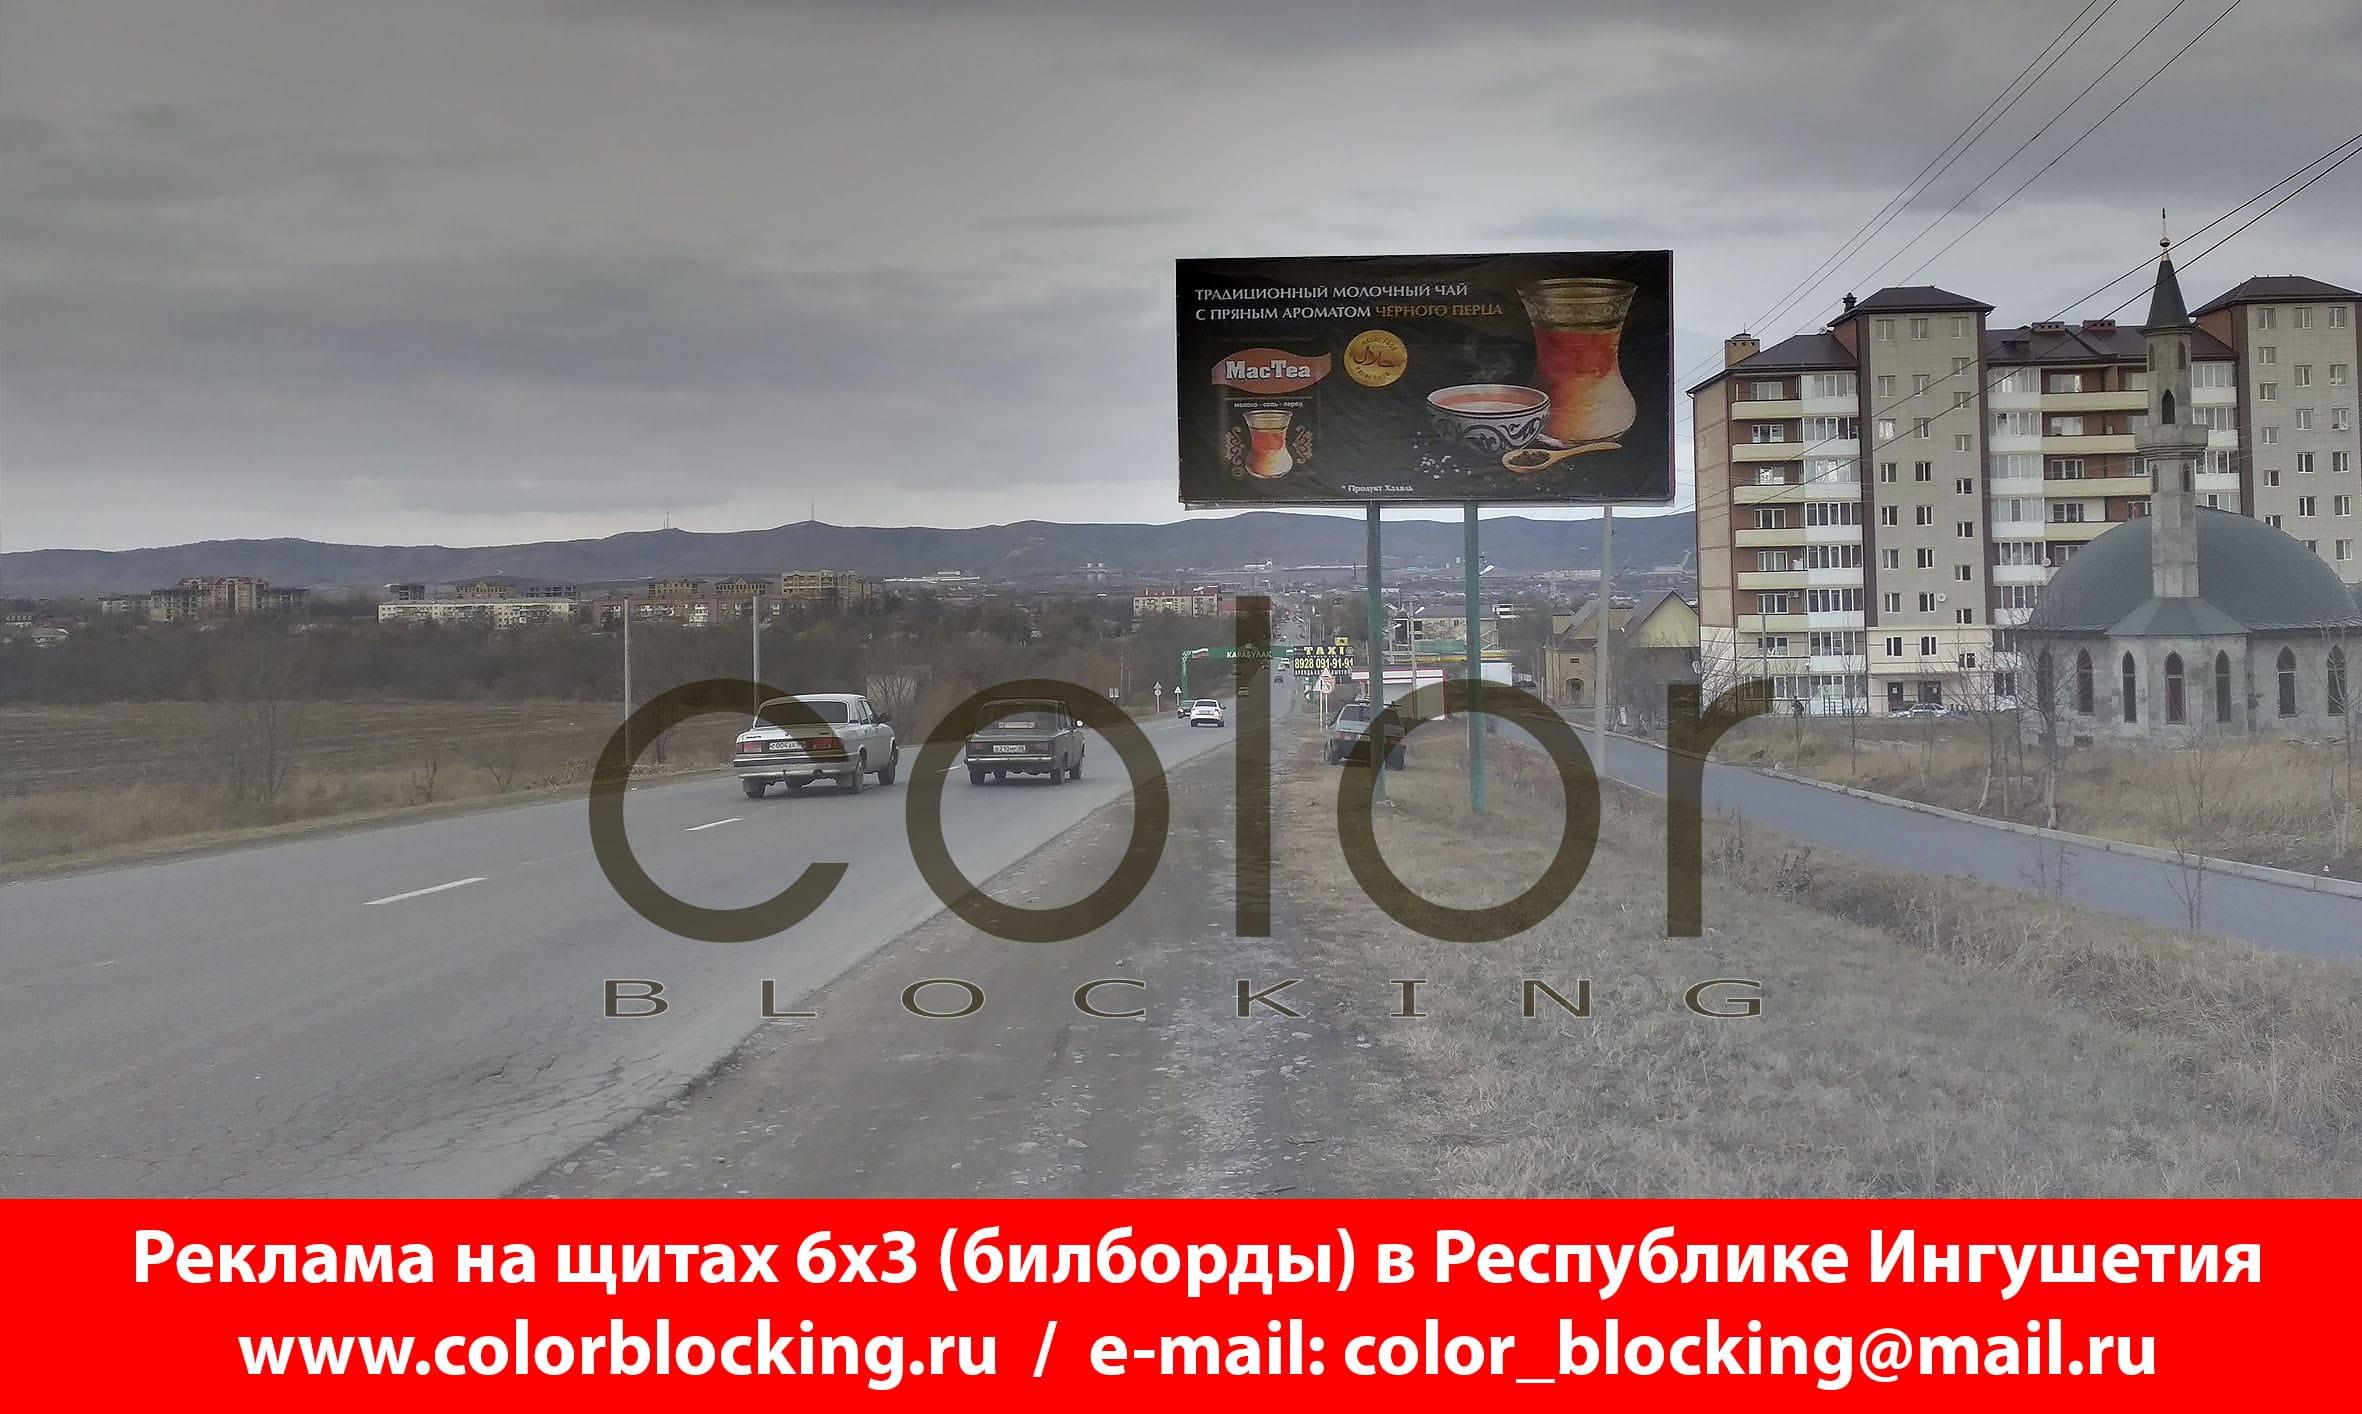 Реклама в Ингушетии на щитах 6х3 Карабулак